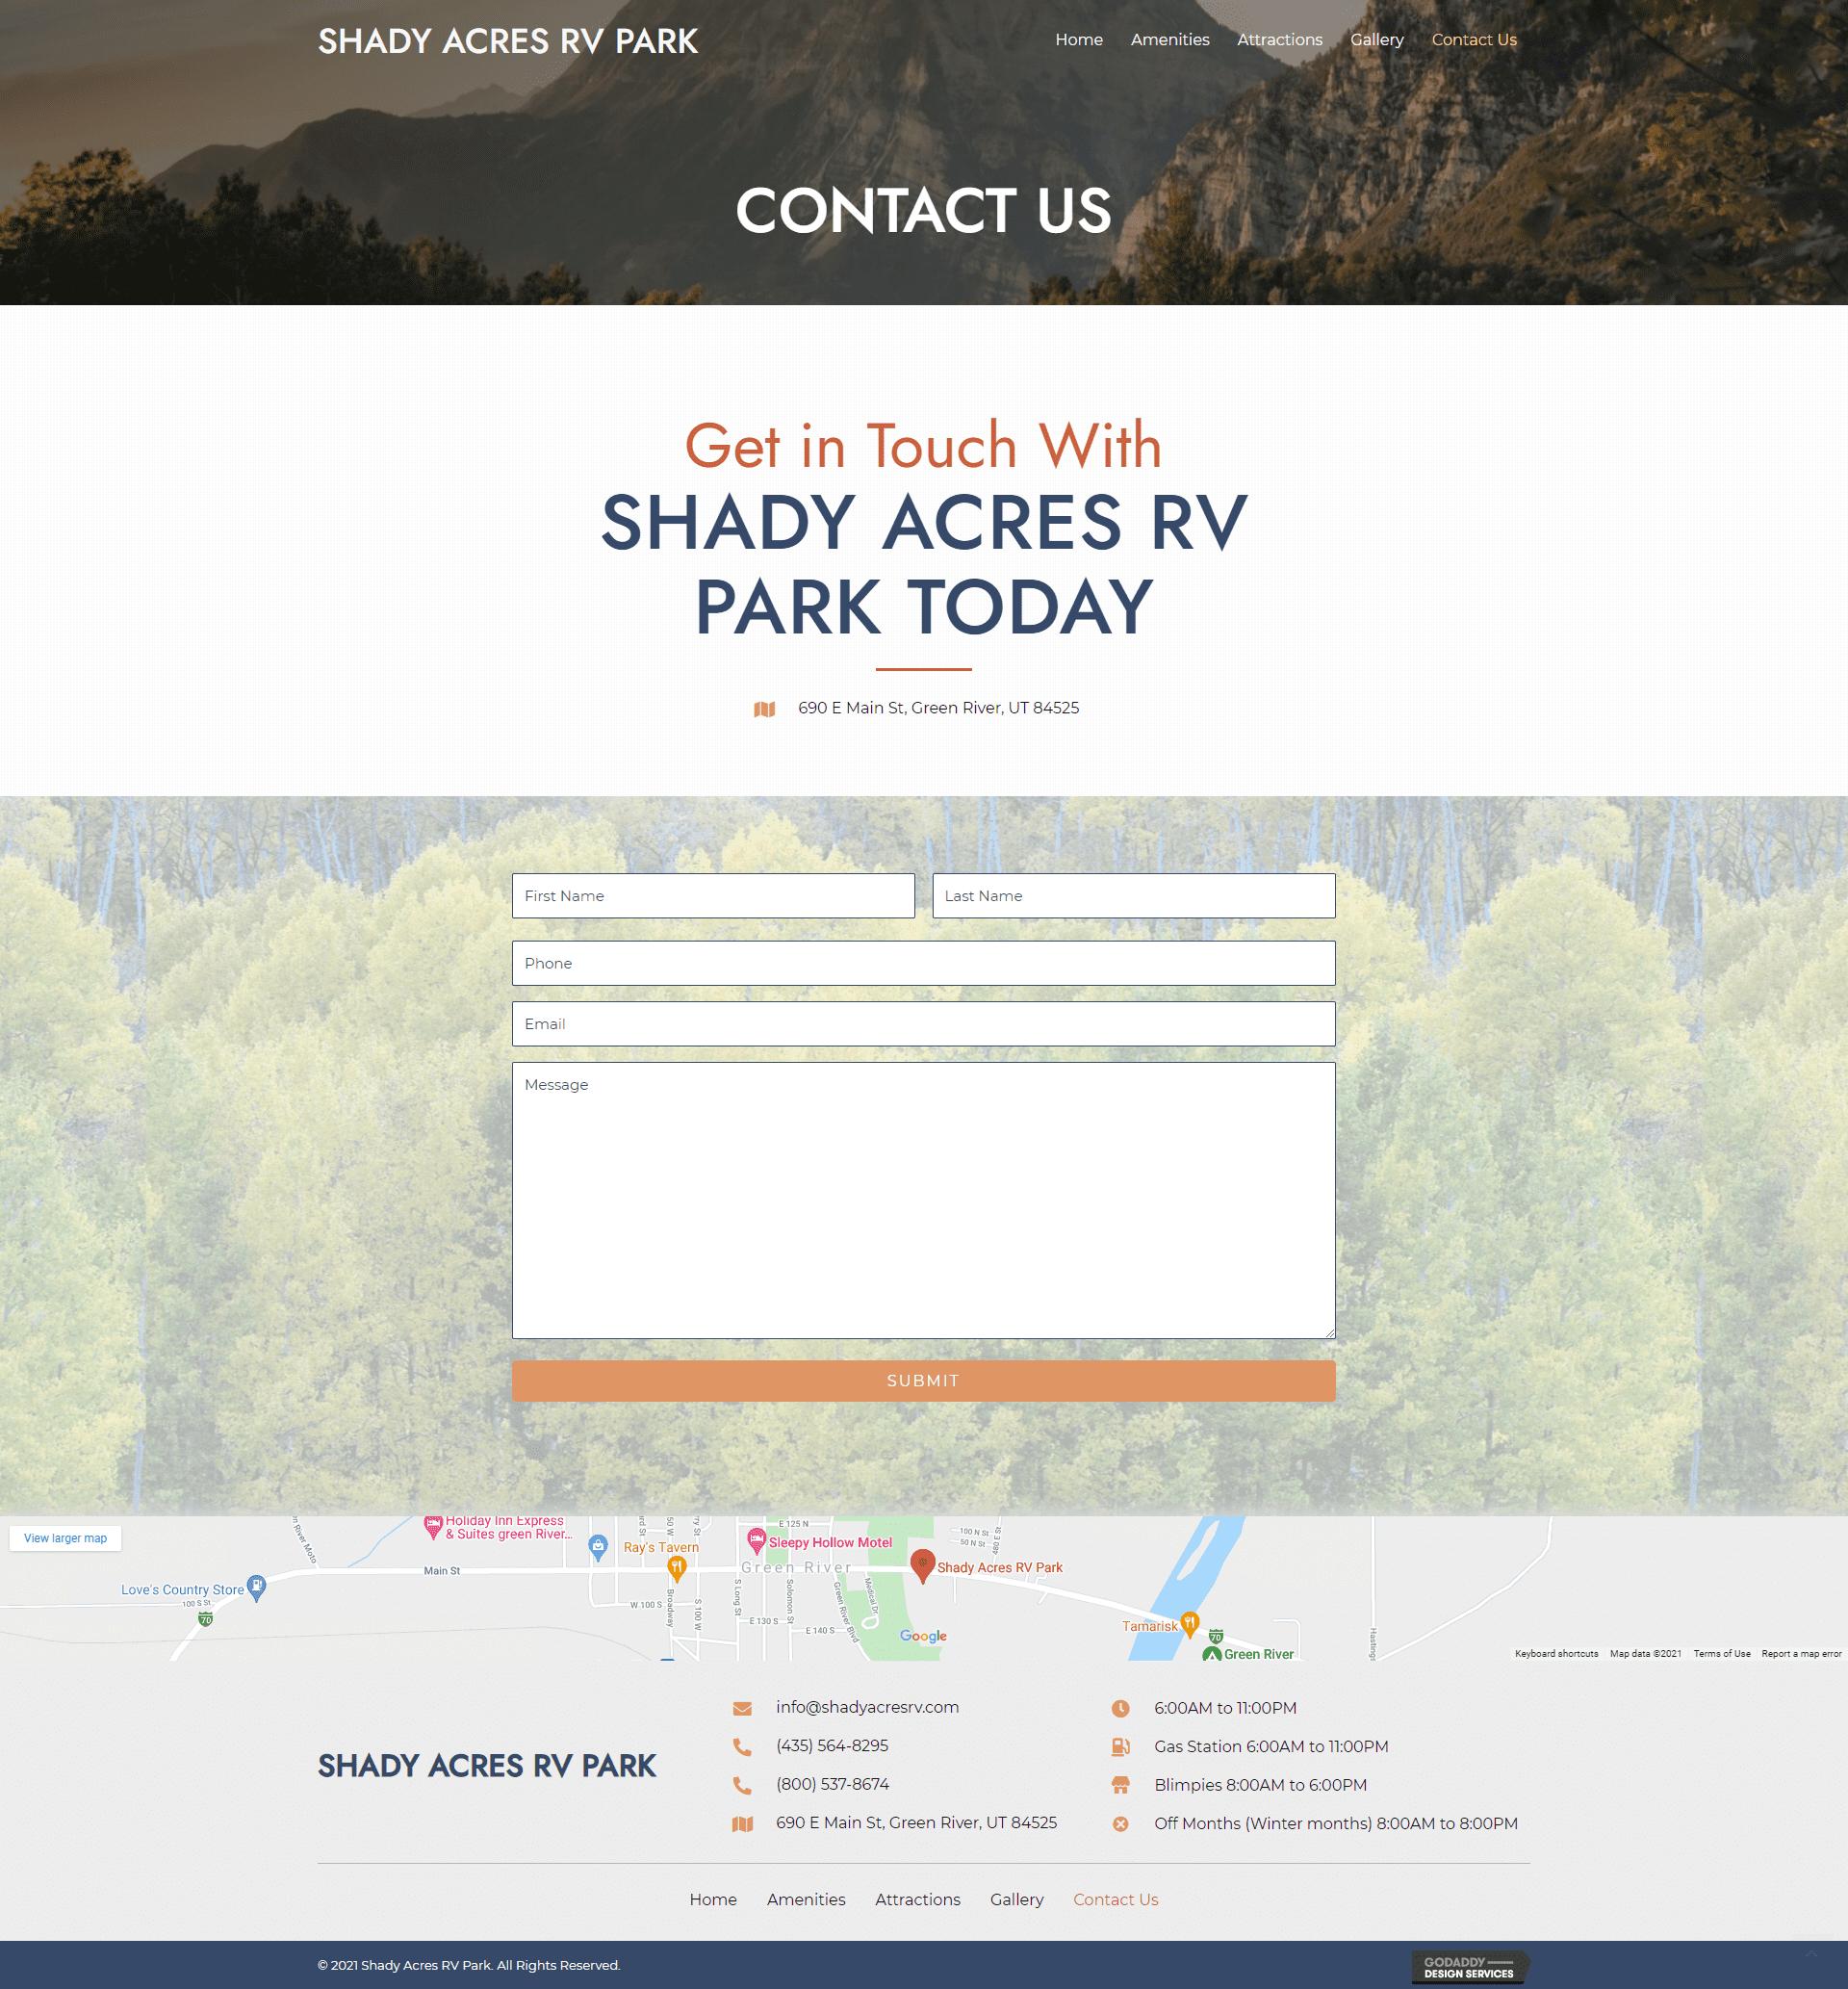 Shady Acres RV Park Contact